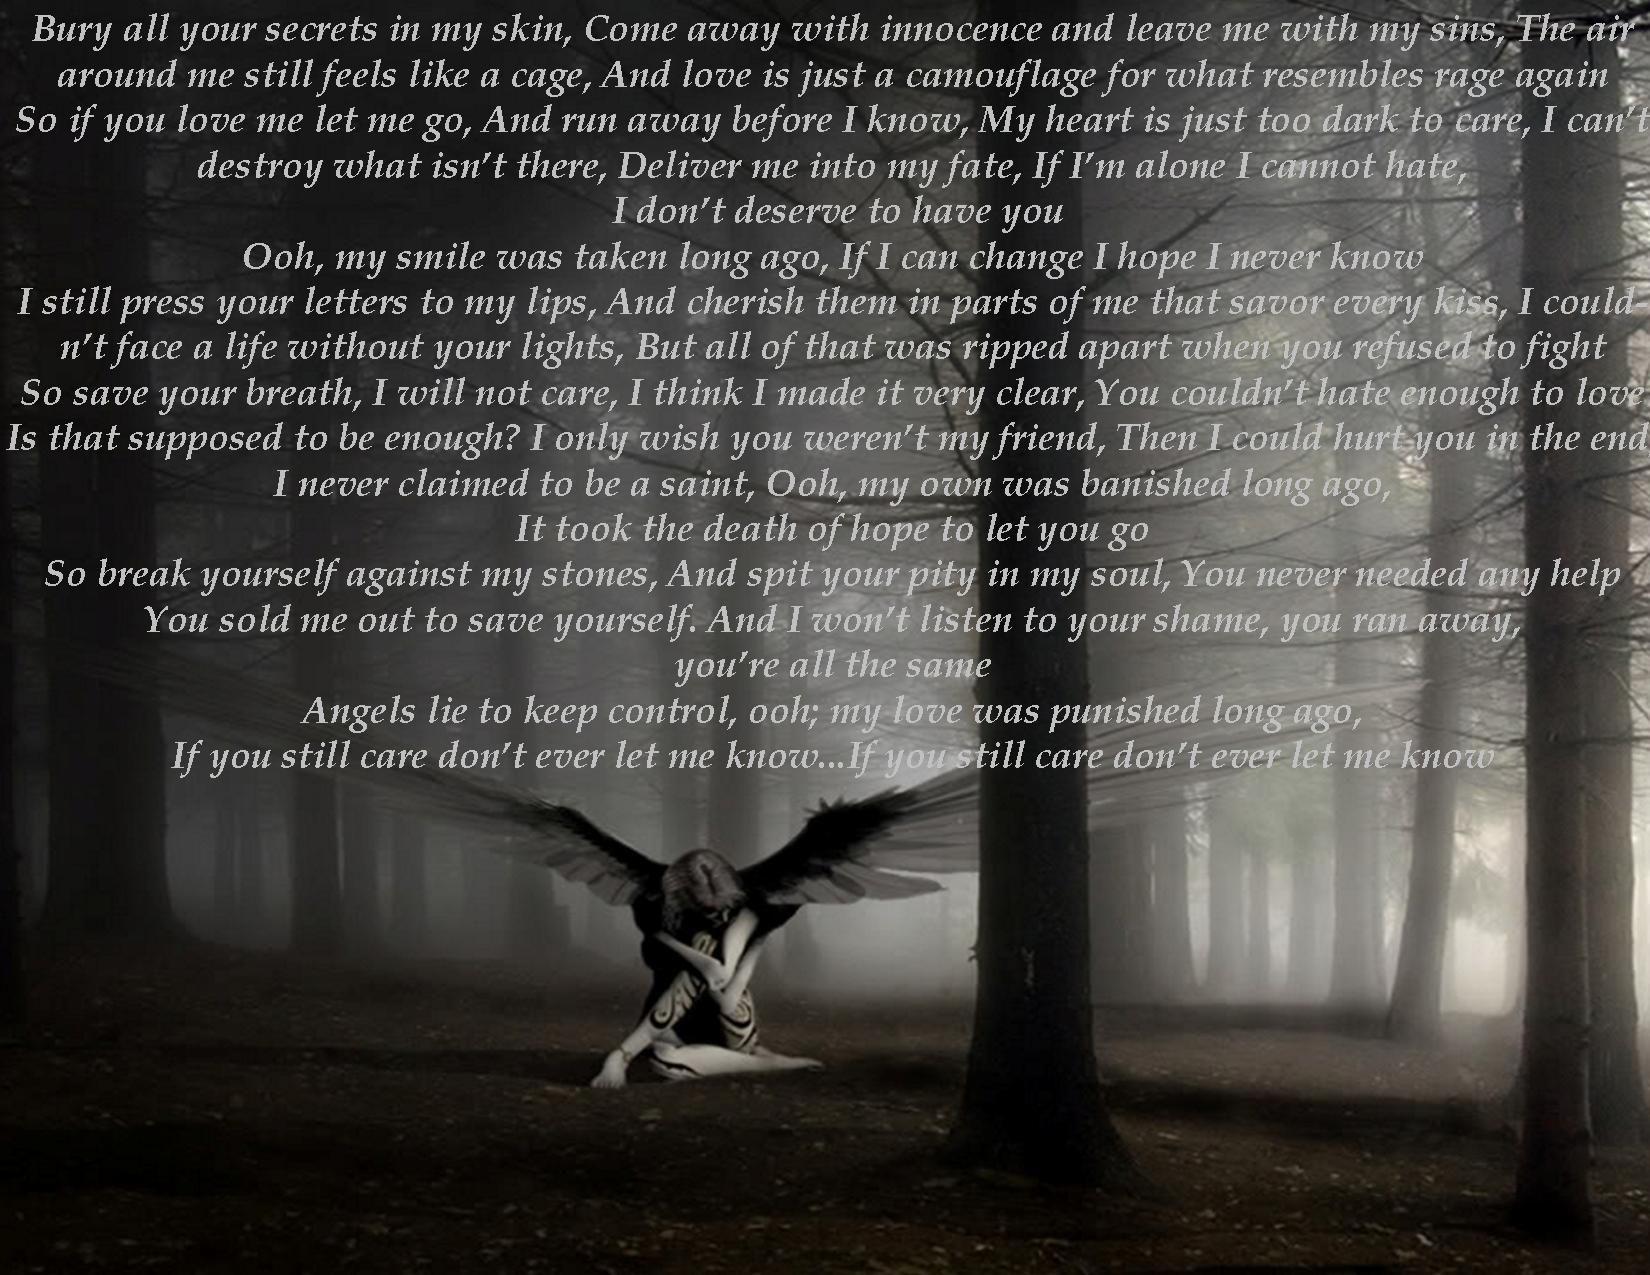 Snuff ~ Slipknot. Have this tattooed down my side. Beautiful lyrics, this  has